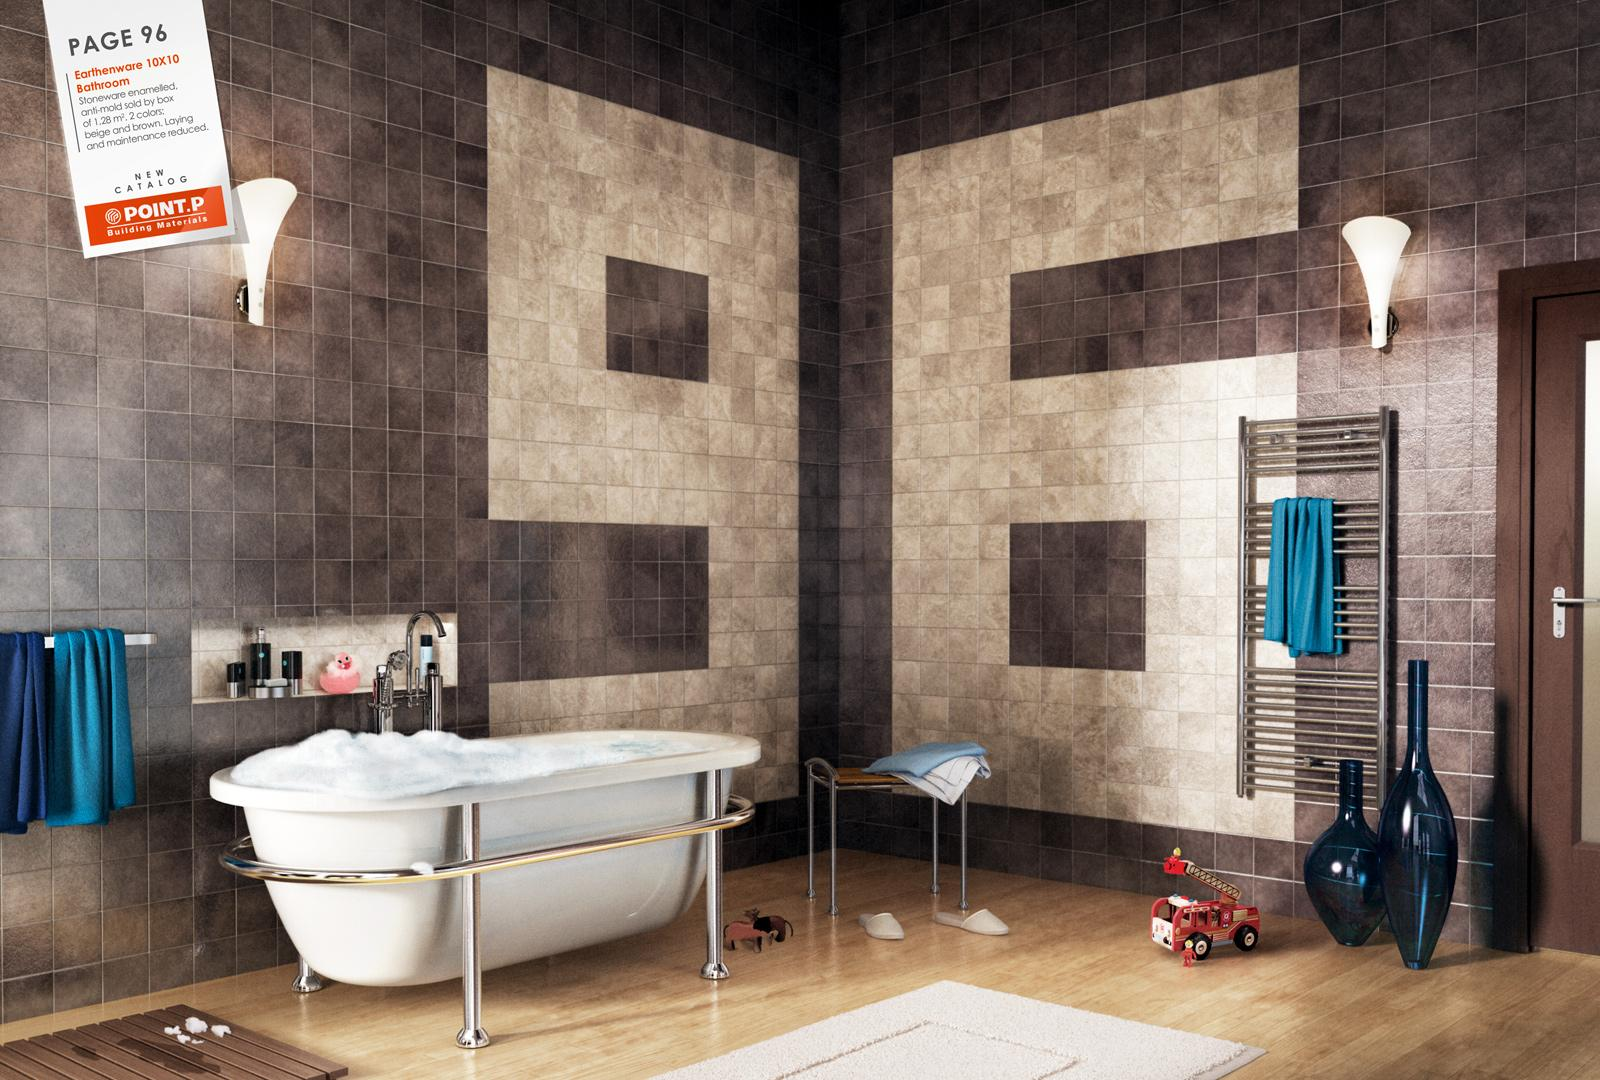 Point P Print Ad -  Bathroom